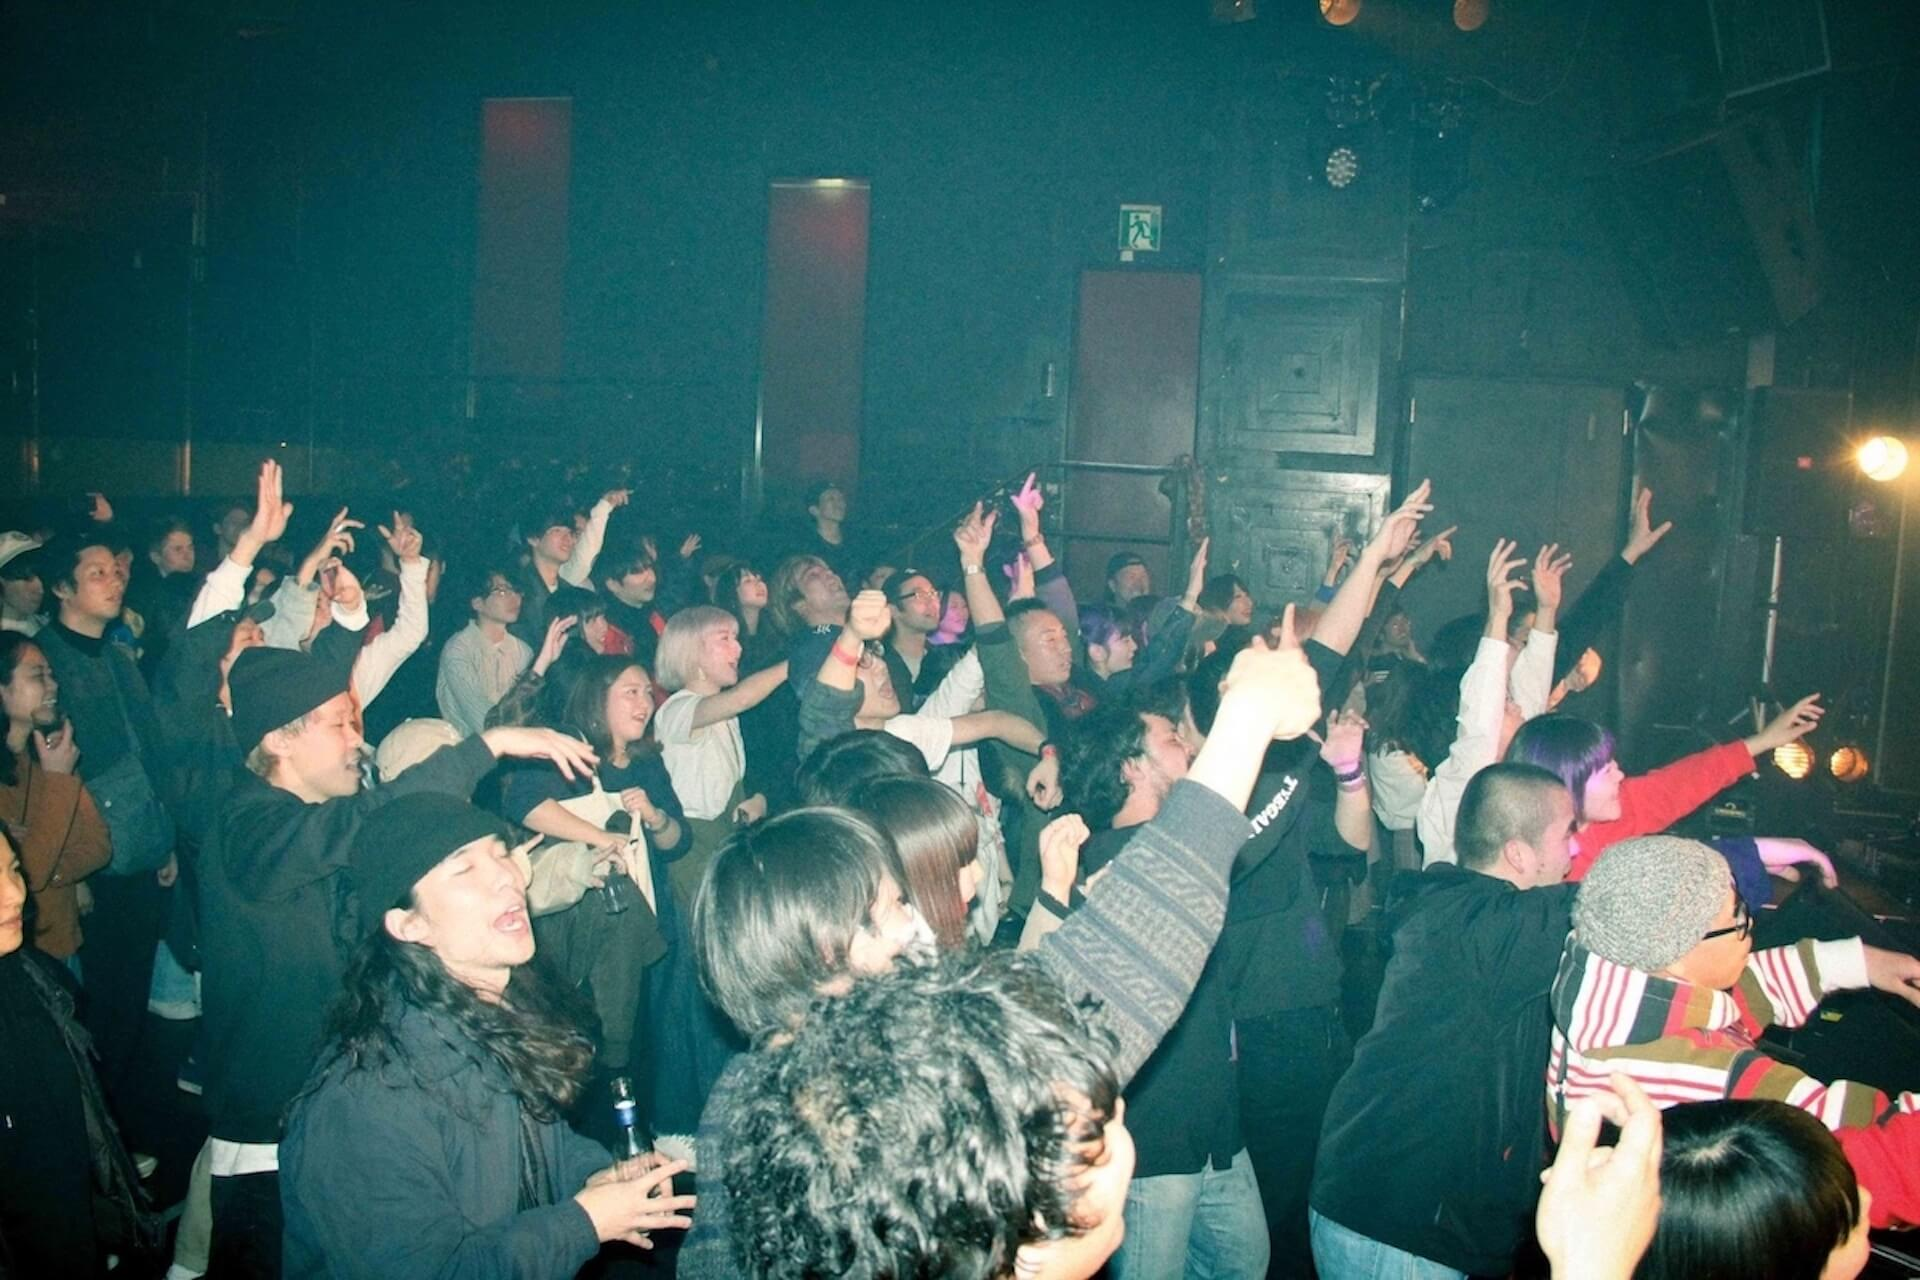 ZONE鼎談|新世代の誕生、6バンド+DJが作る新たなインディシーン interview-zone2-1